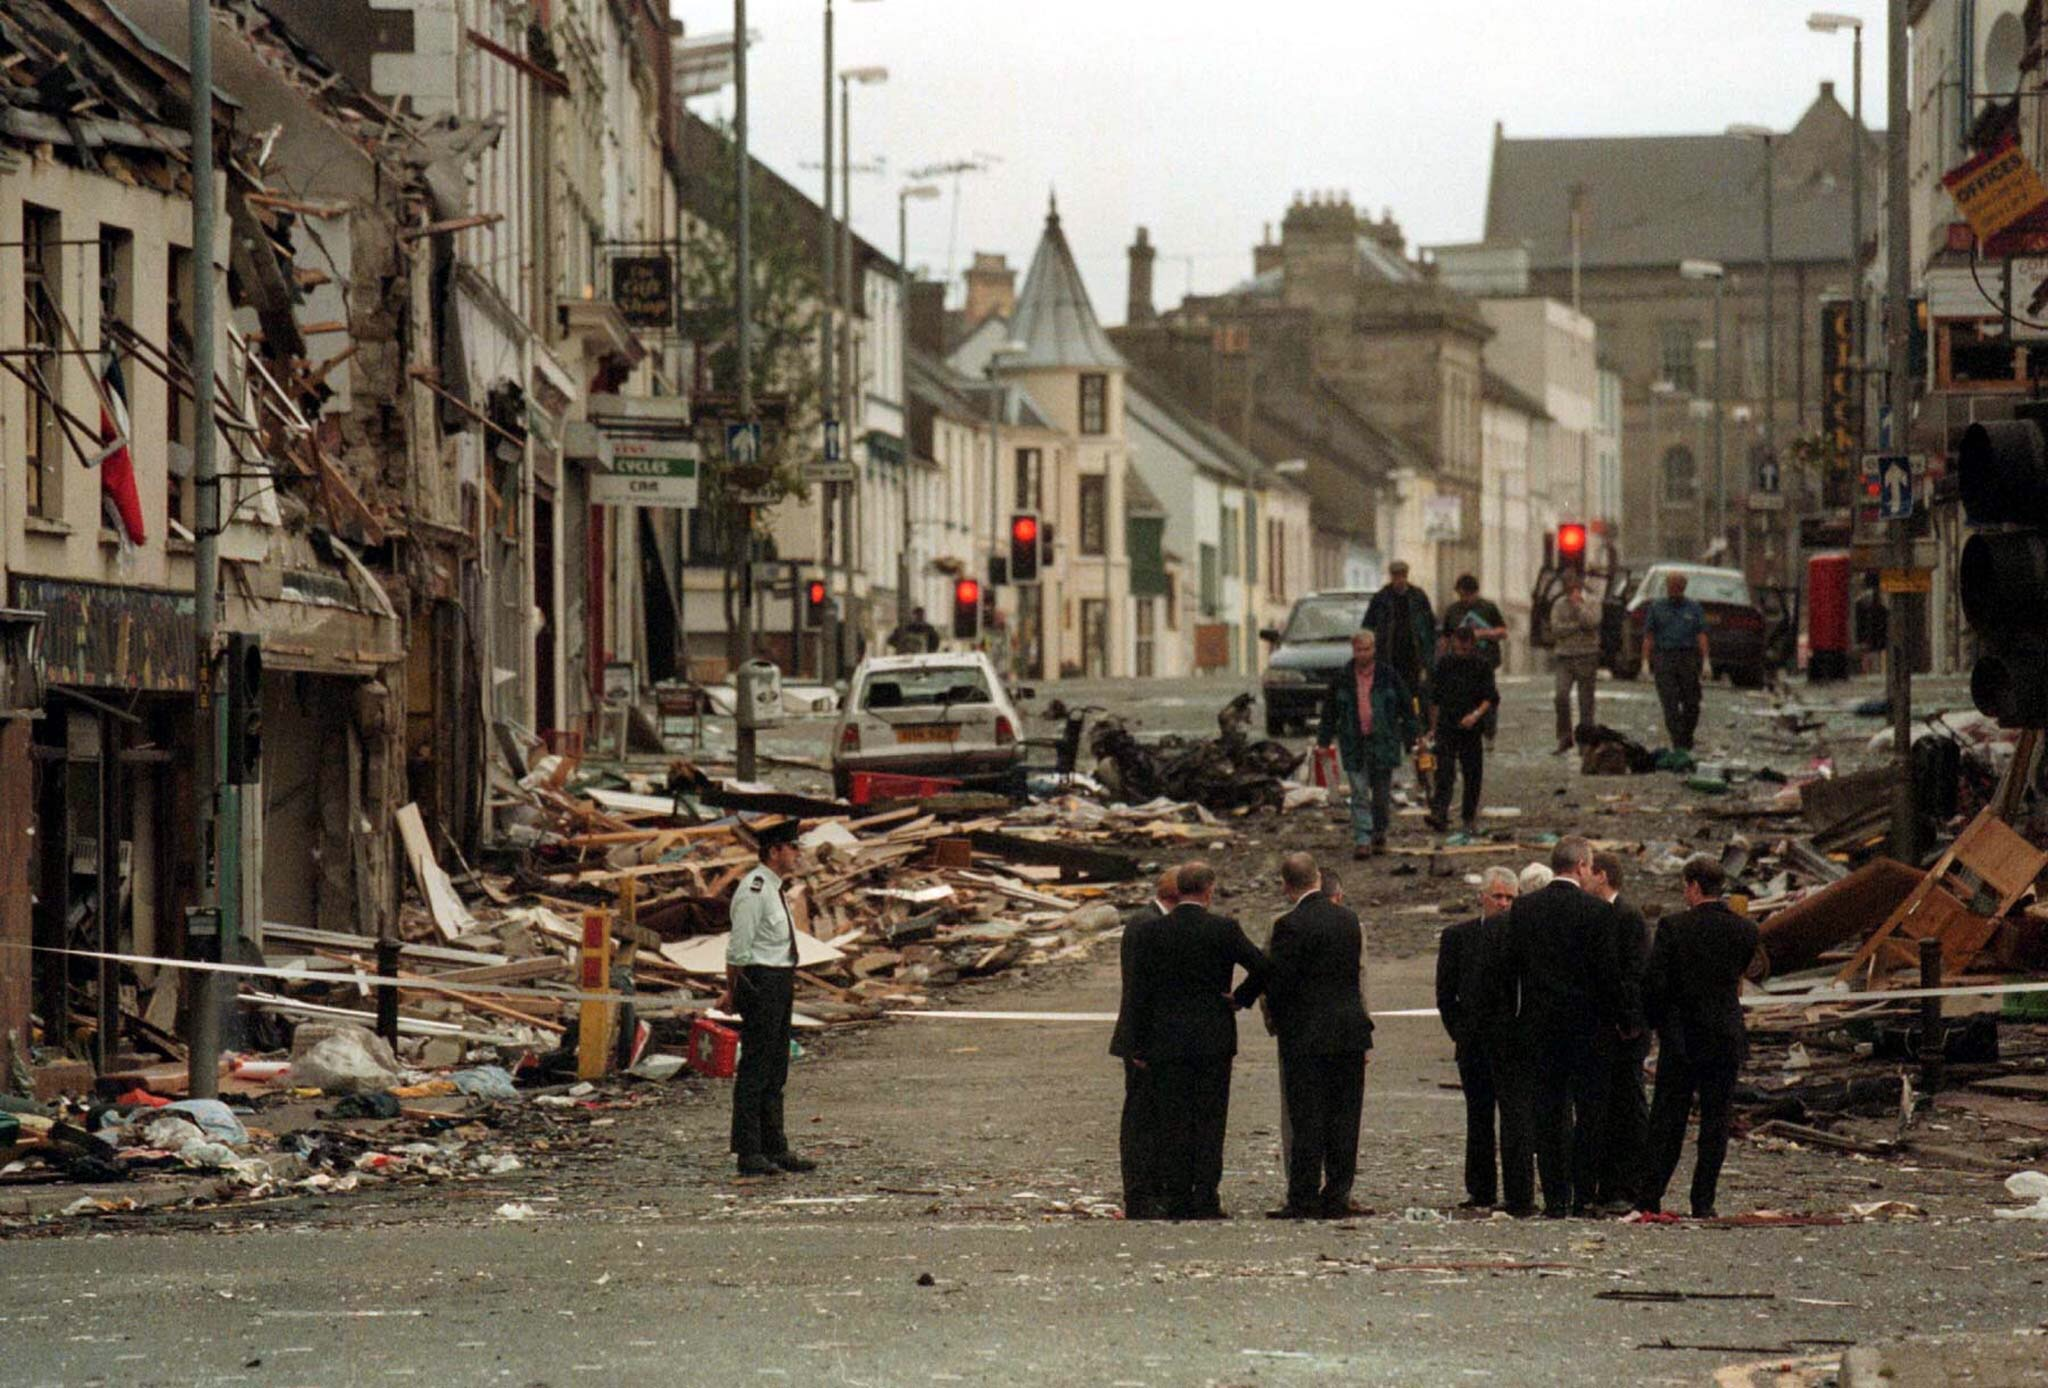 IRA APOLOGISES TO FAMILIES OF CIBVILAN CASUALTIES.